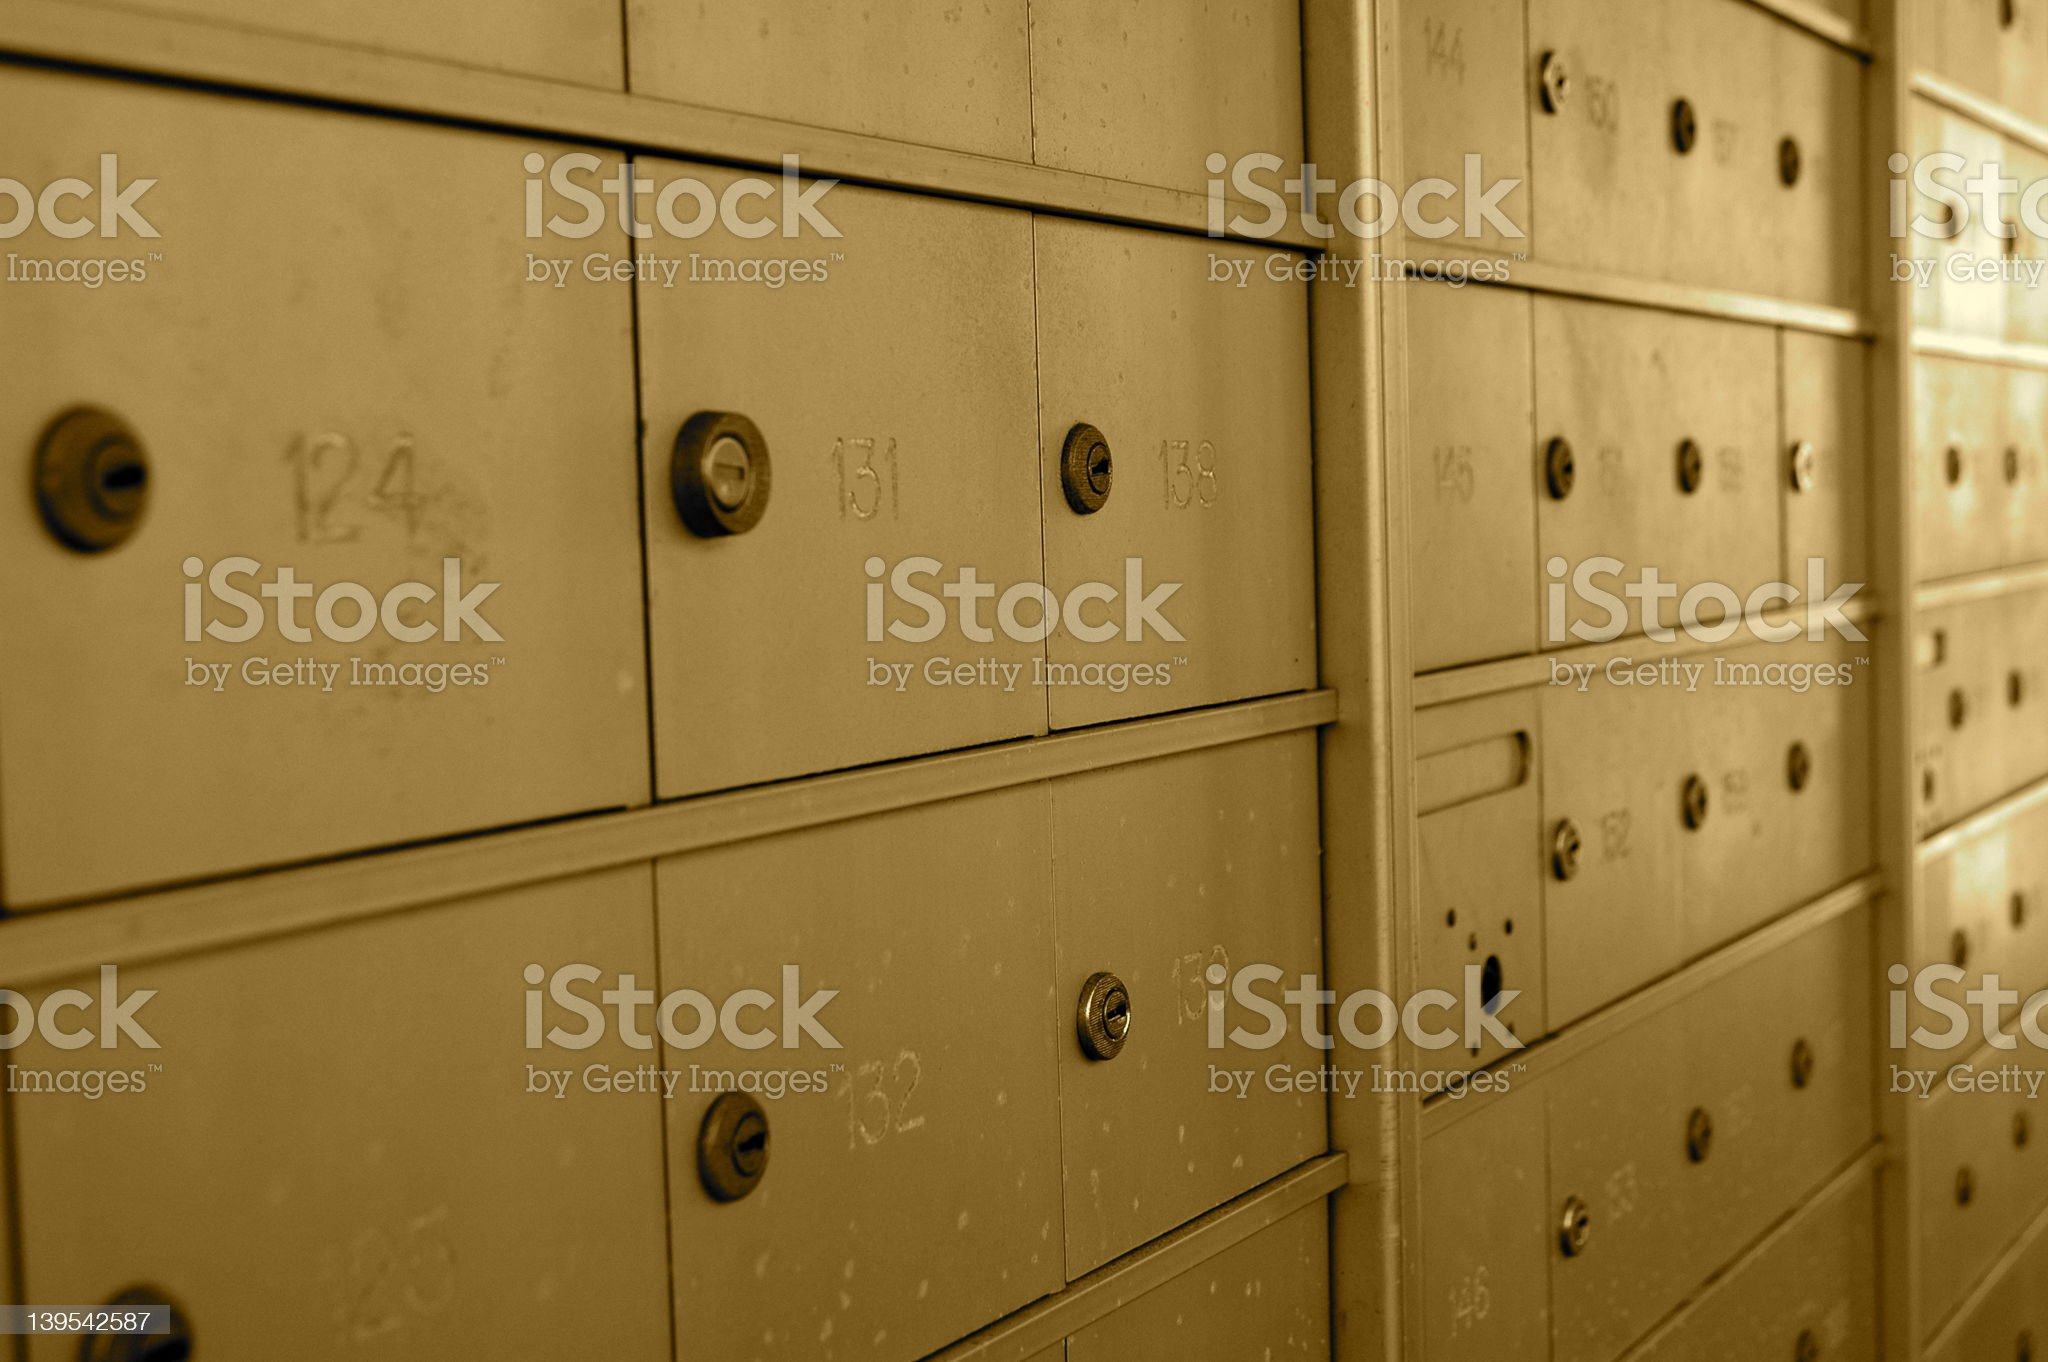 P.O. Box 124 royalty-free stock photo